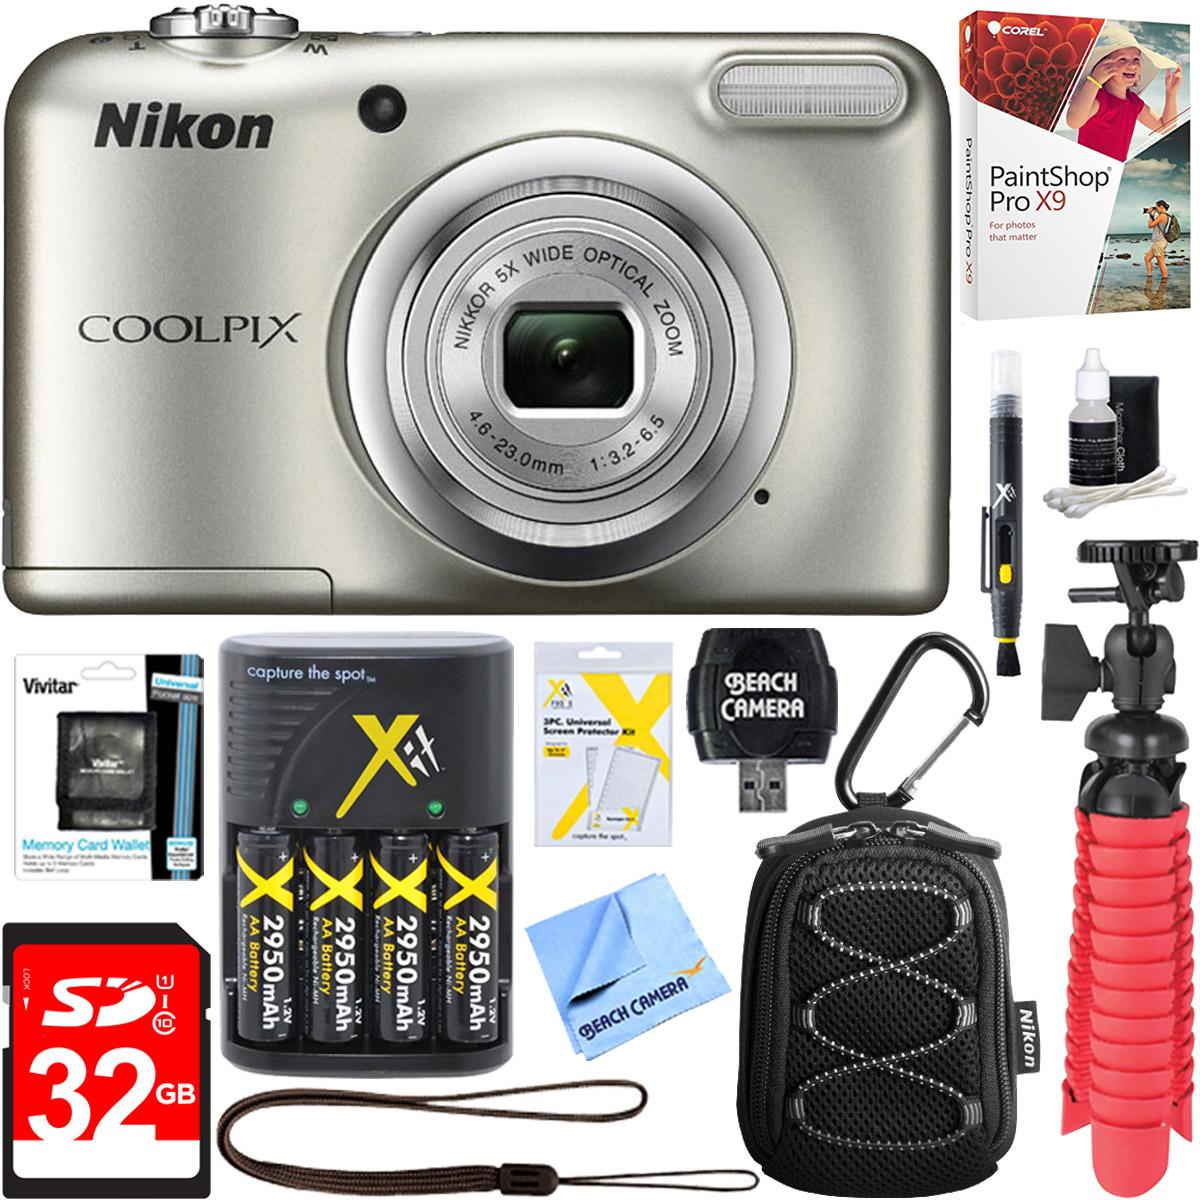 Nikon COOLPIX A10 16.1MP 5x Optical Zoom NIKKOR Glass Lens Digital Camera...